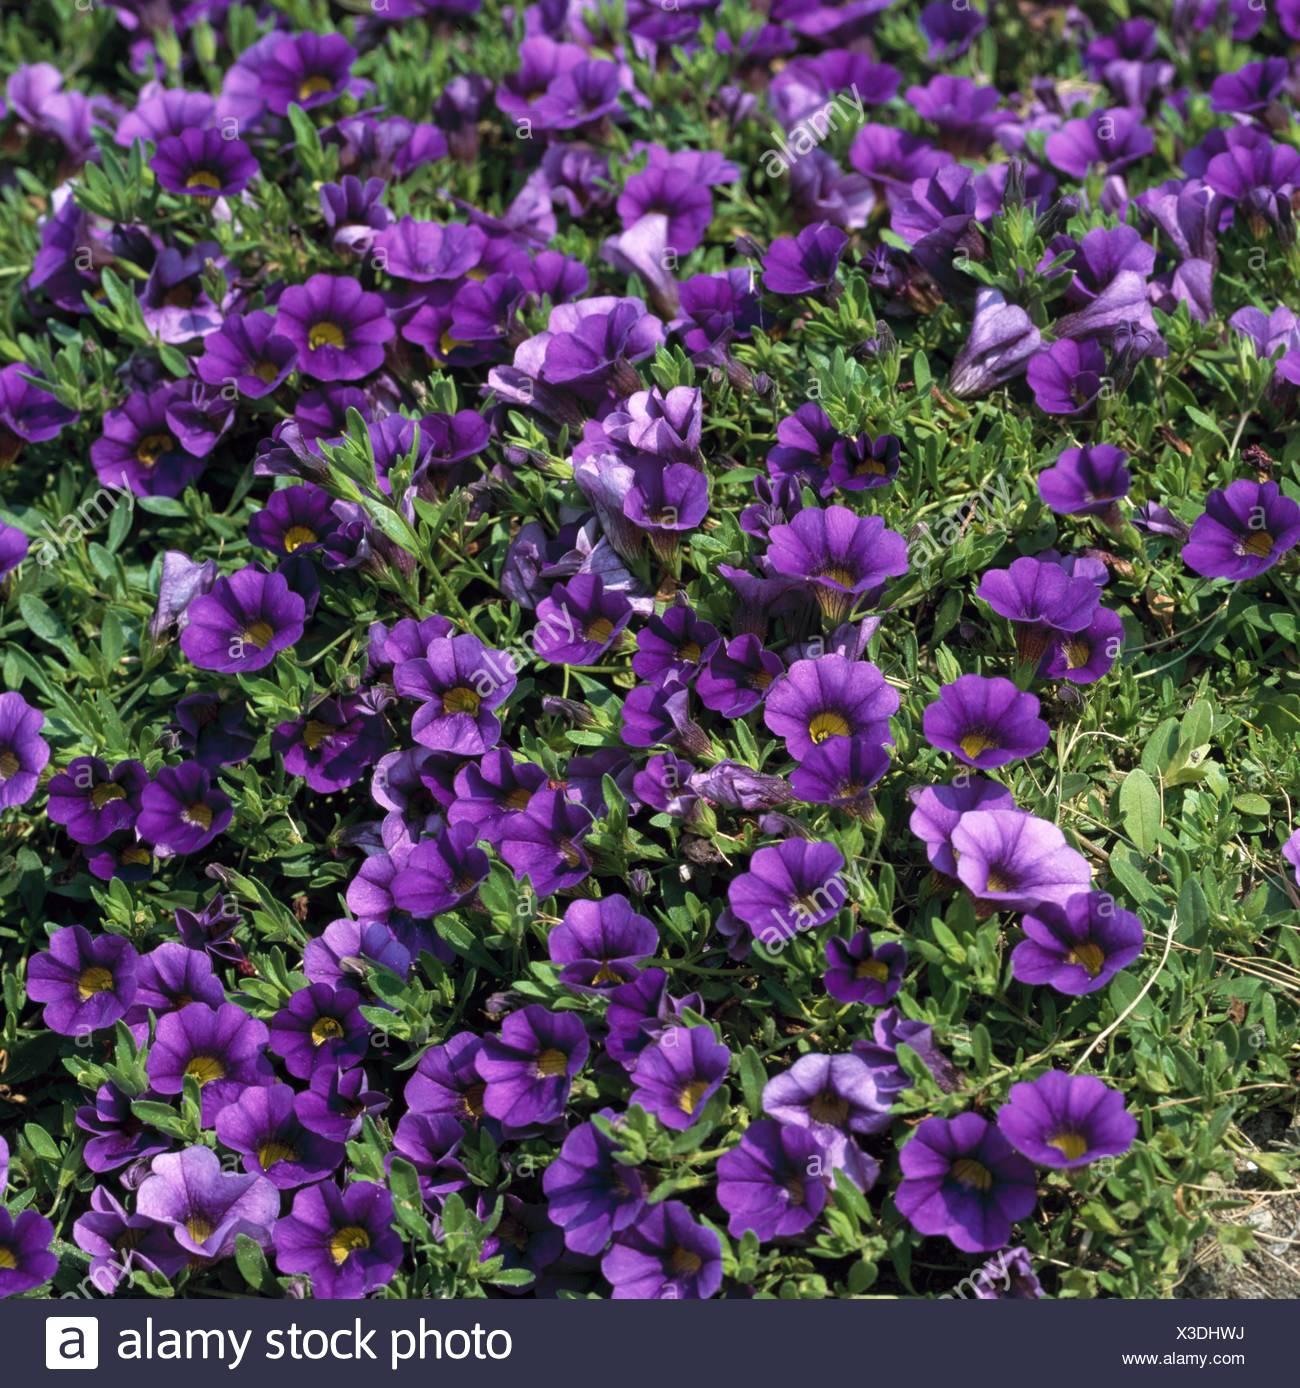 Calibrachoa - 'Million Bells Trailing Blue' - (Syn. Petunia `Million Bells Trailing Blue')   ANN103350  Compulsory Cre - Stock Image